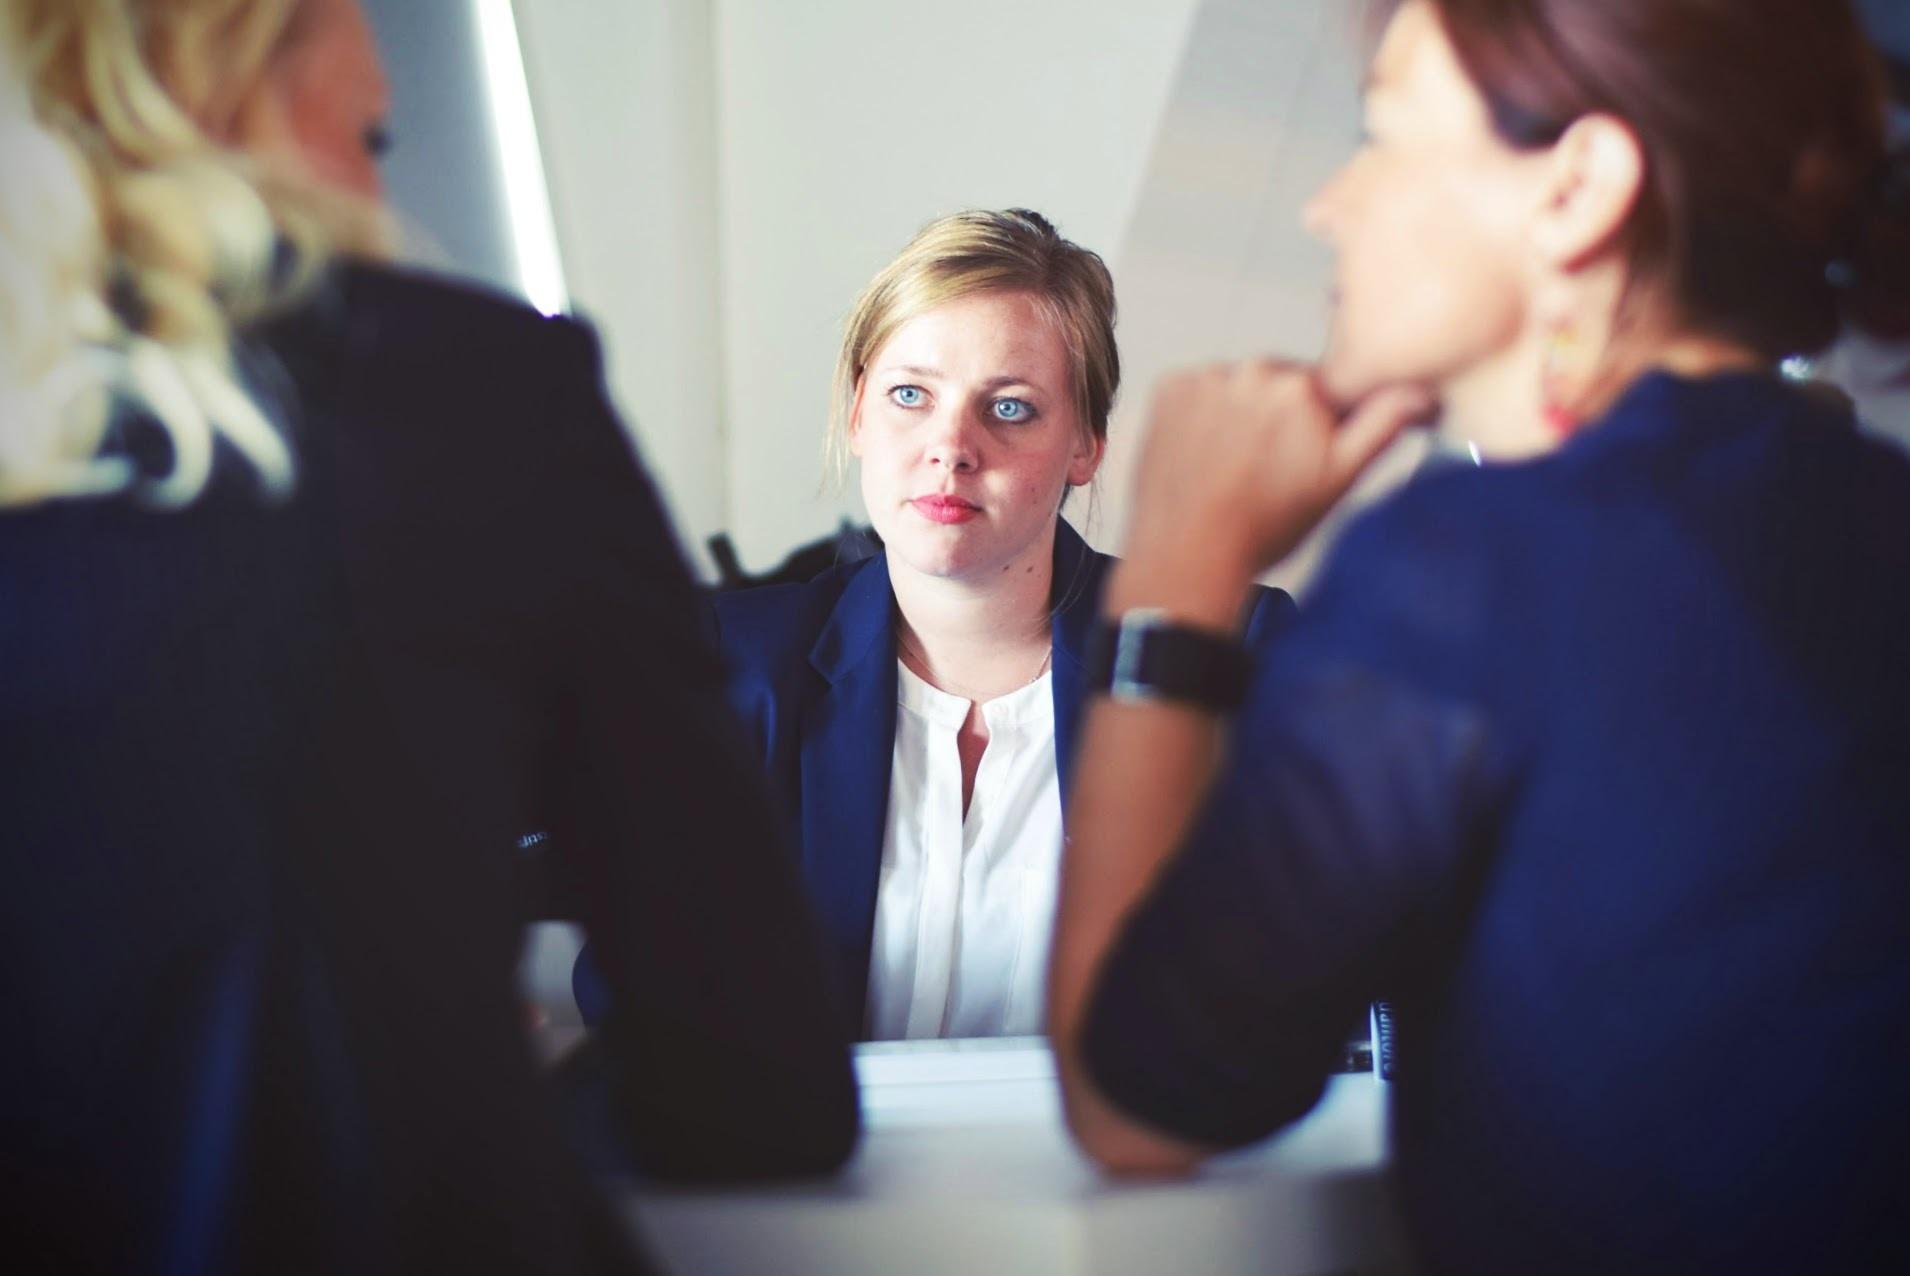 Office conflicts between women seen as more damaging